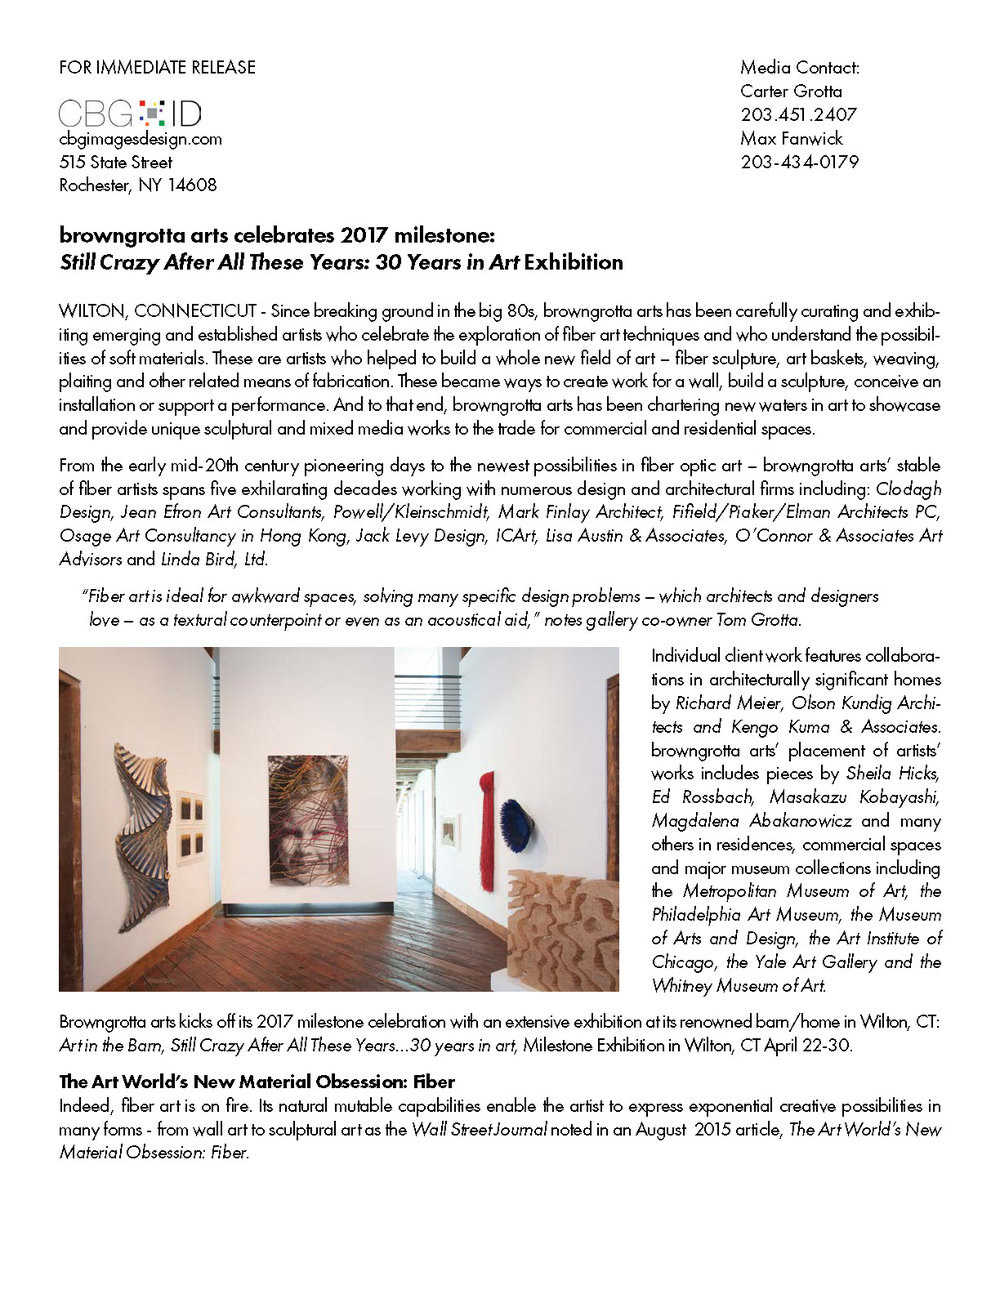 Browngrotta+Arts+Press+Release_Page_1.jpg